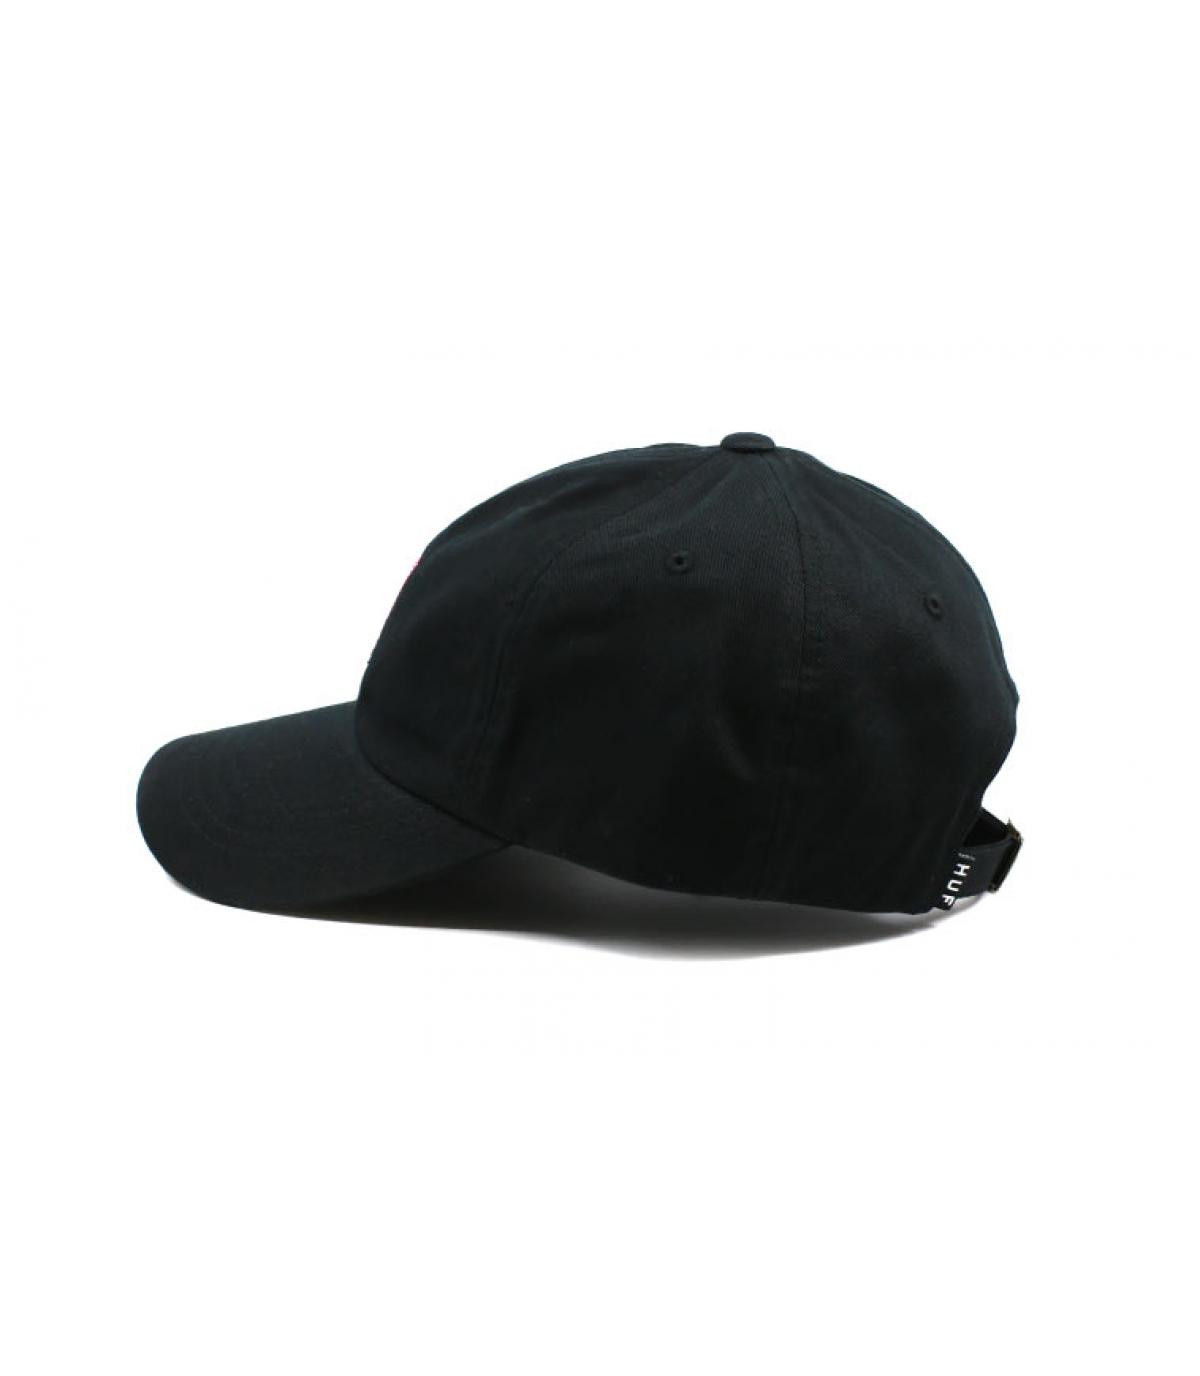 Details Curve Sedona black - Abbildung 4